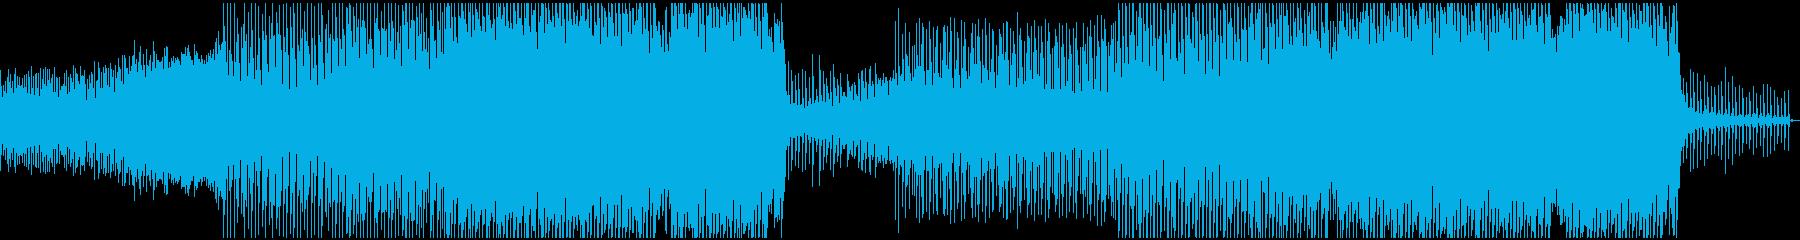 Whistling Forest EDM's reproduced waveform